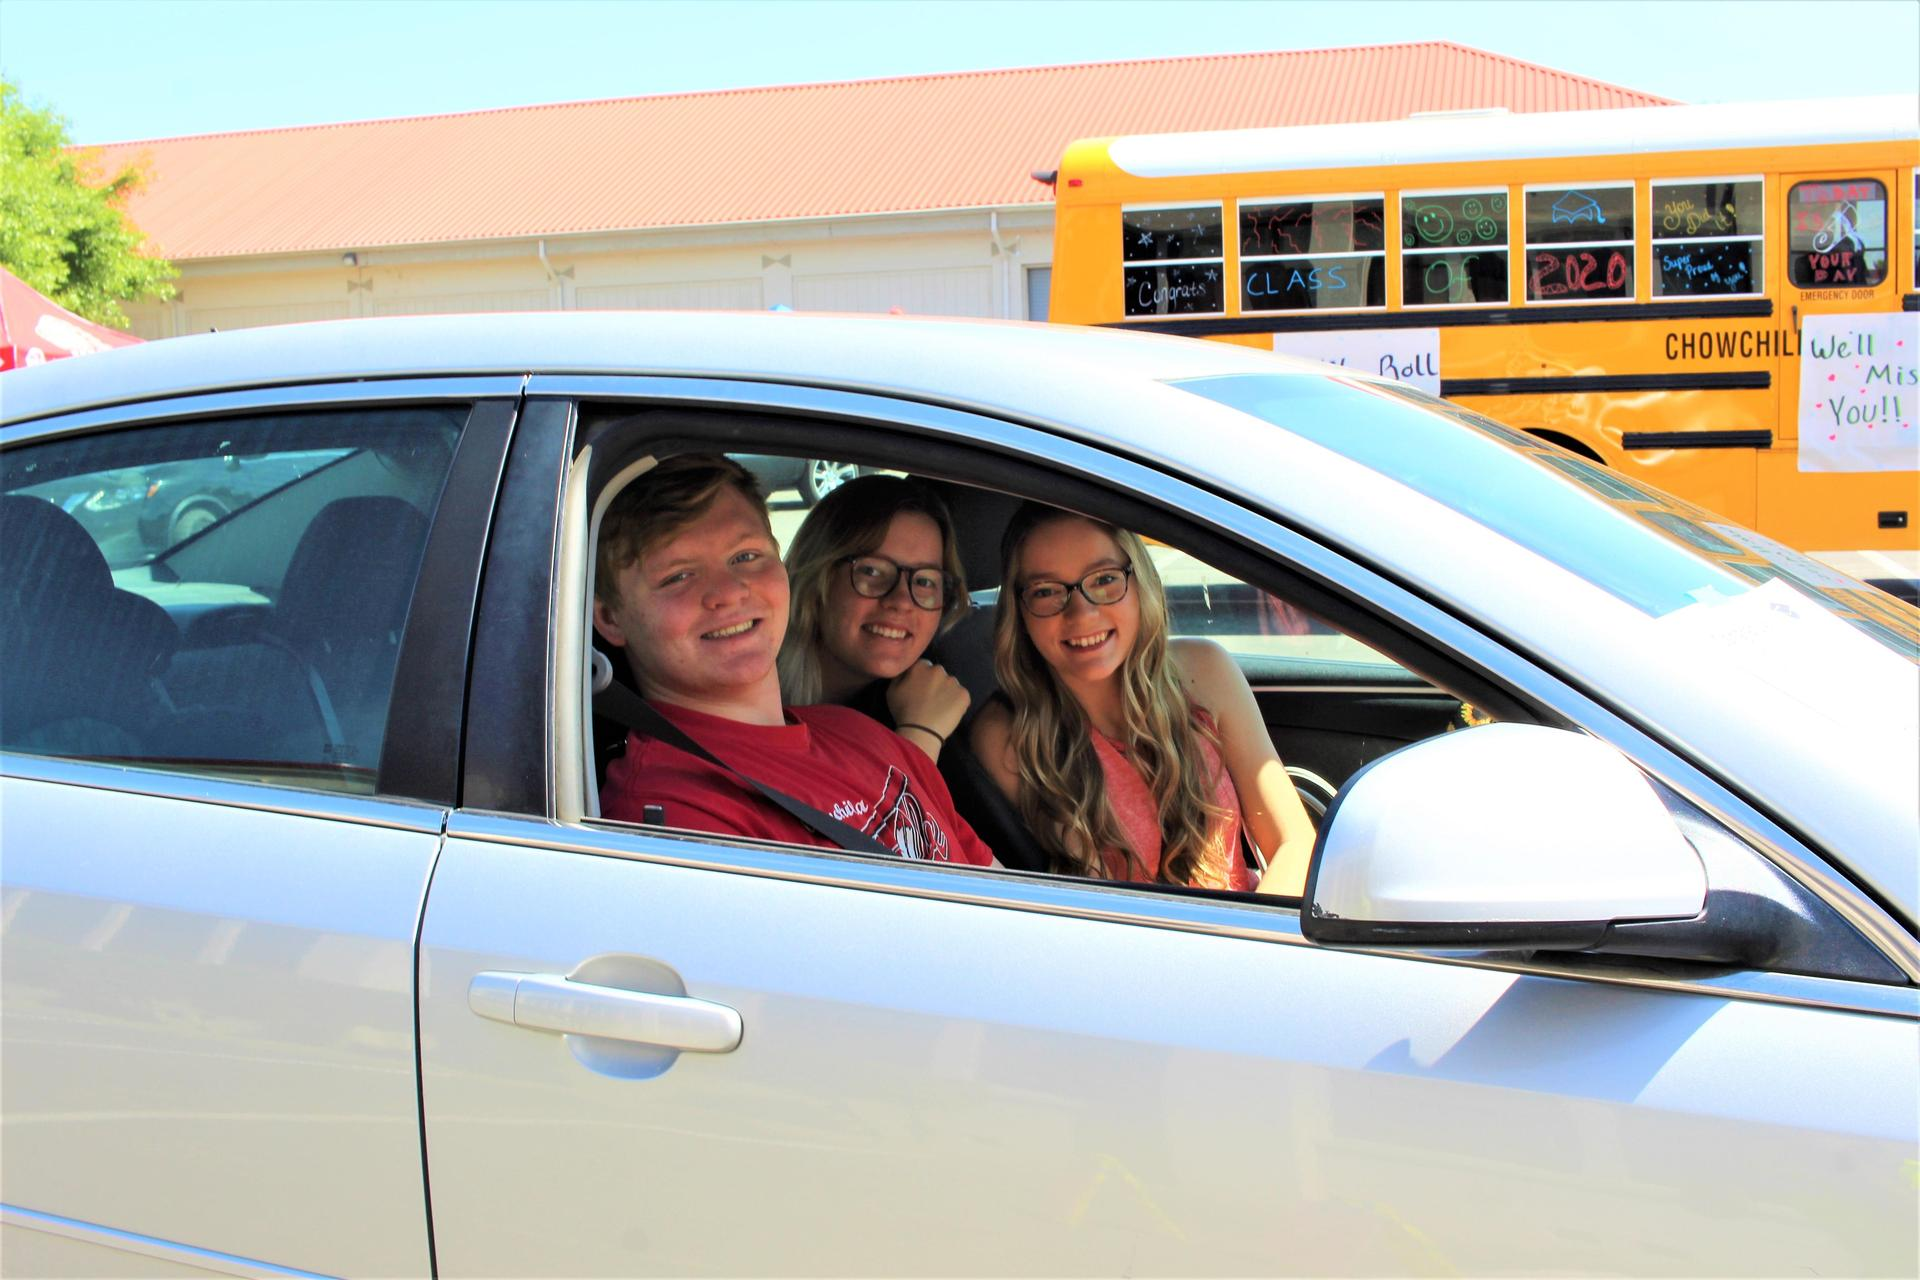 Zachary Ellison and Emma McCluskey riding with Samantha McCluskey driving